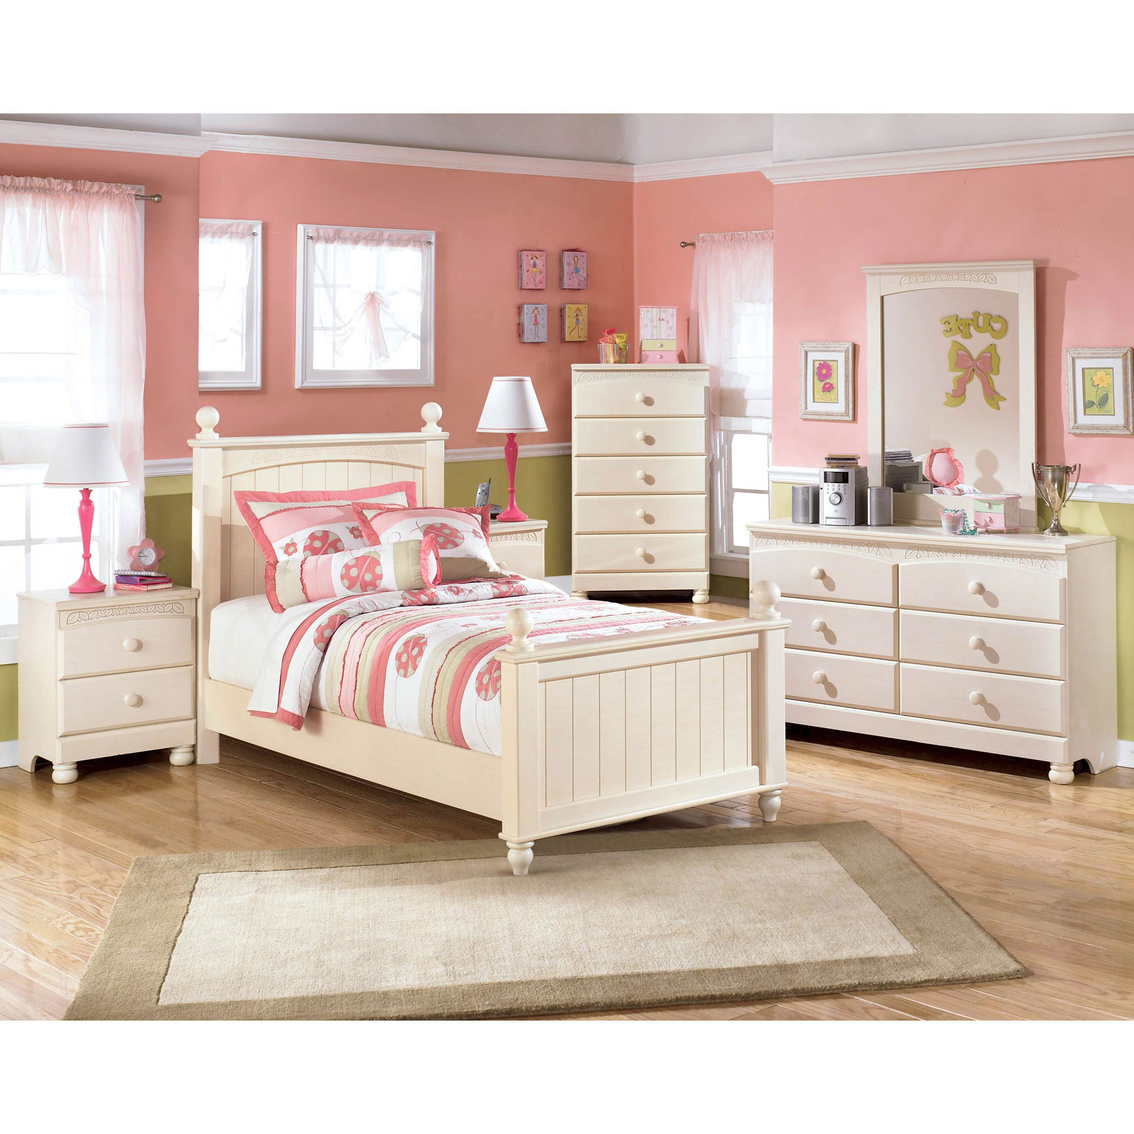 Fullsize Of Twin Bedroom Sets